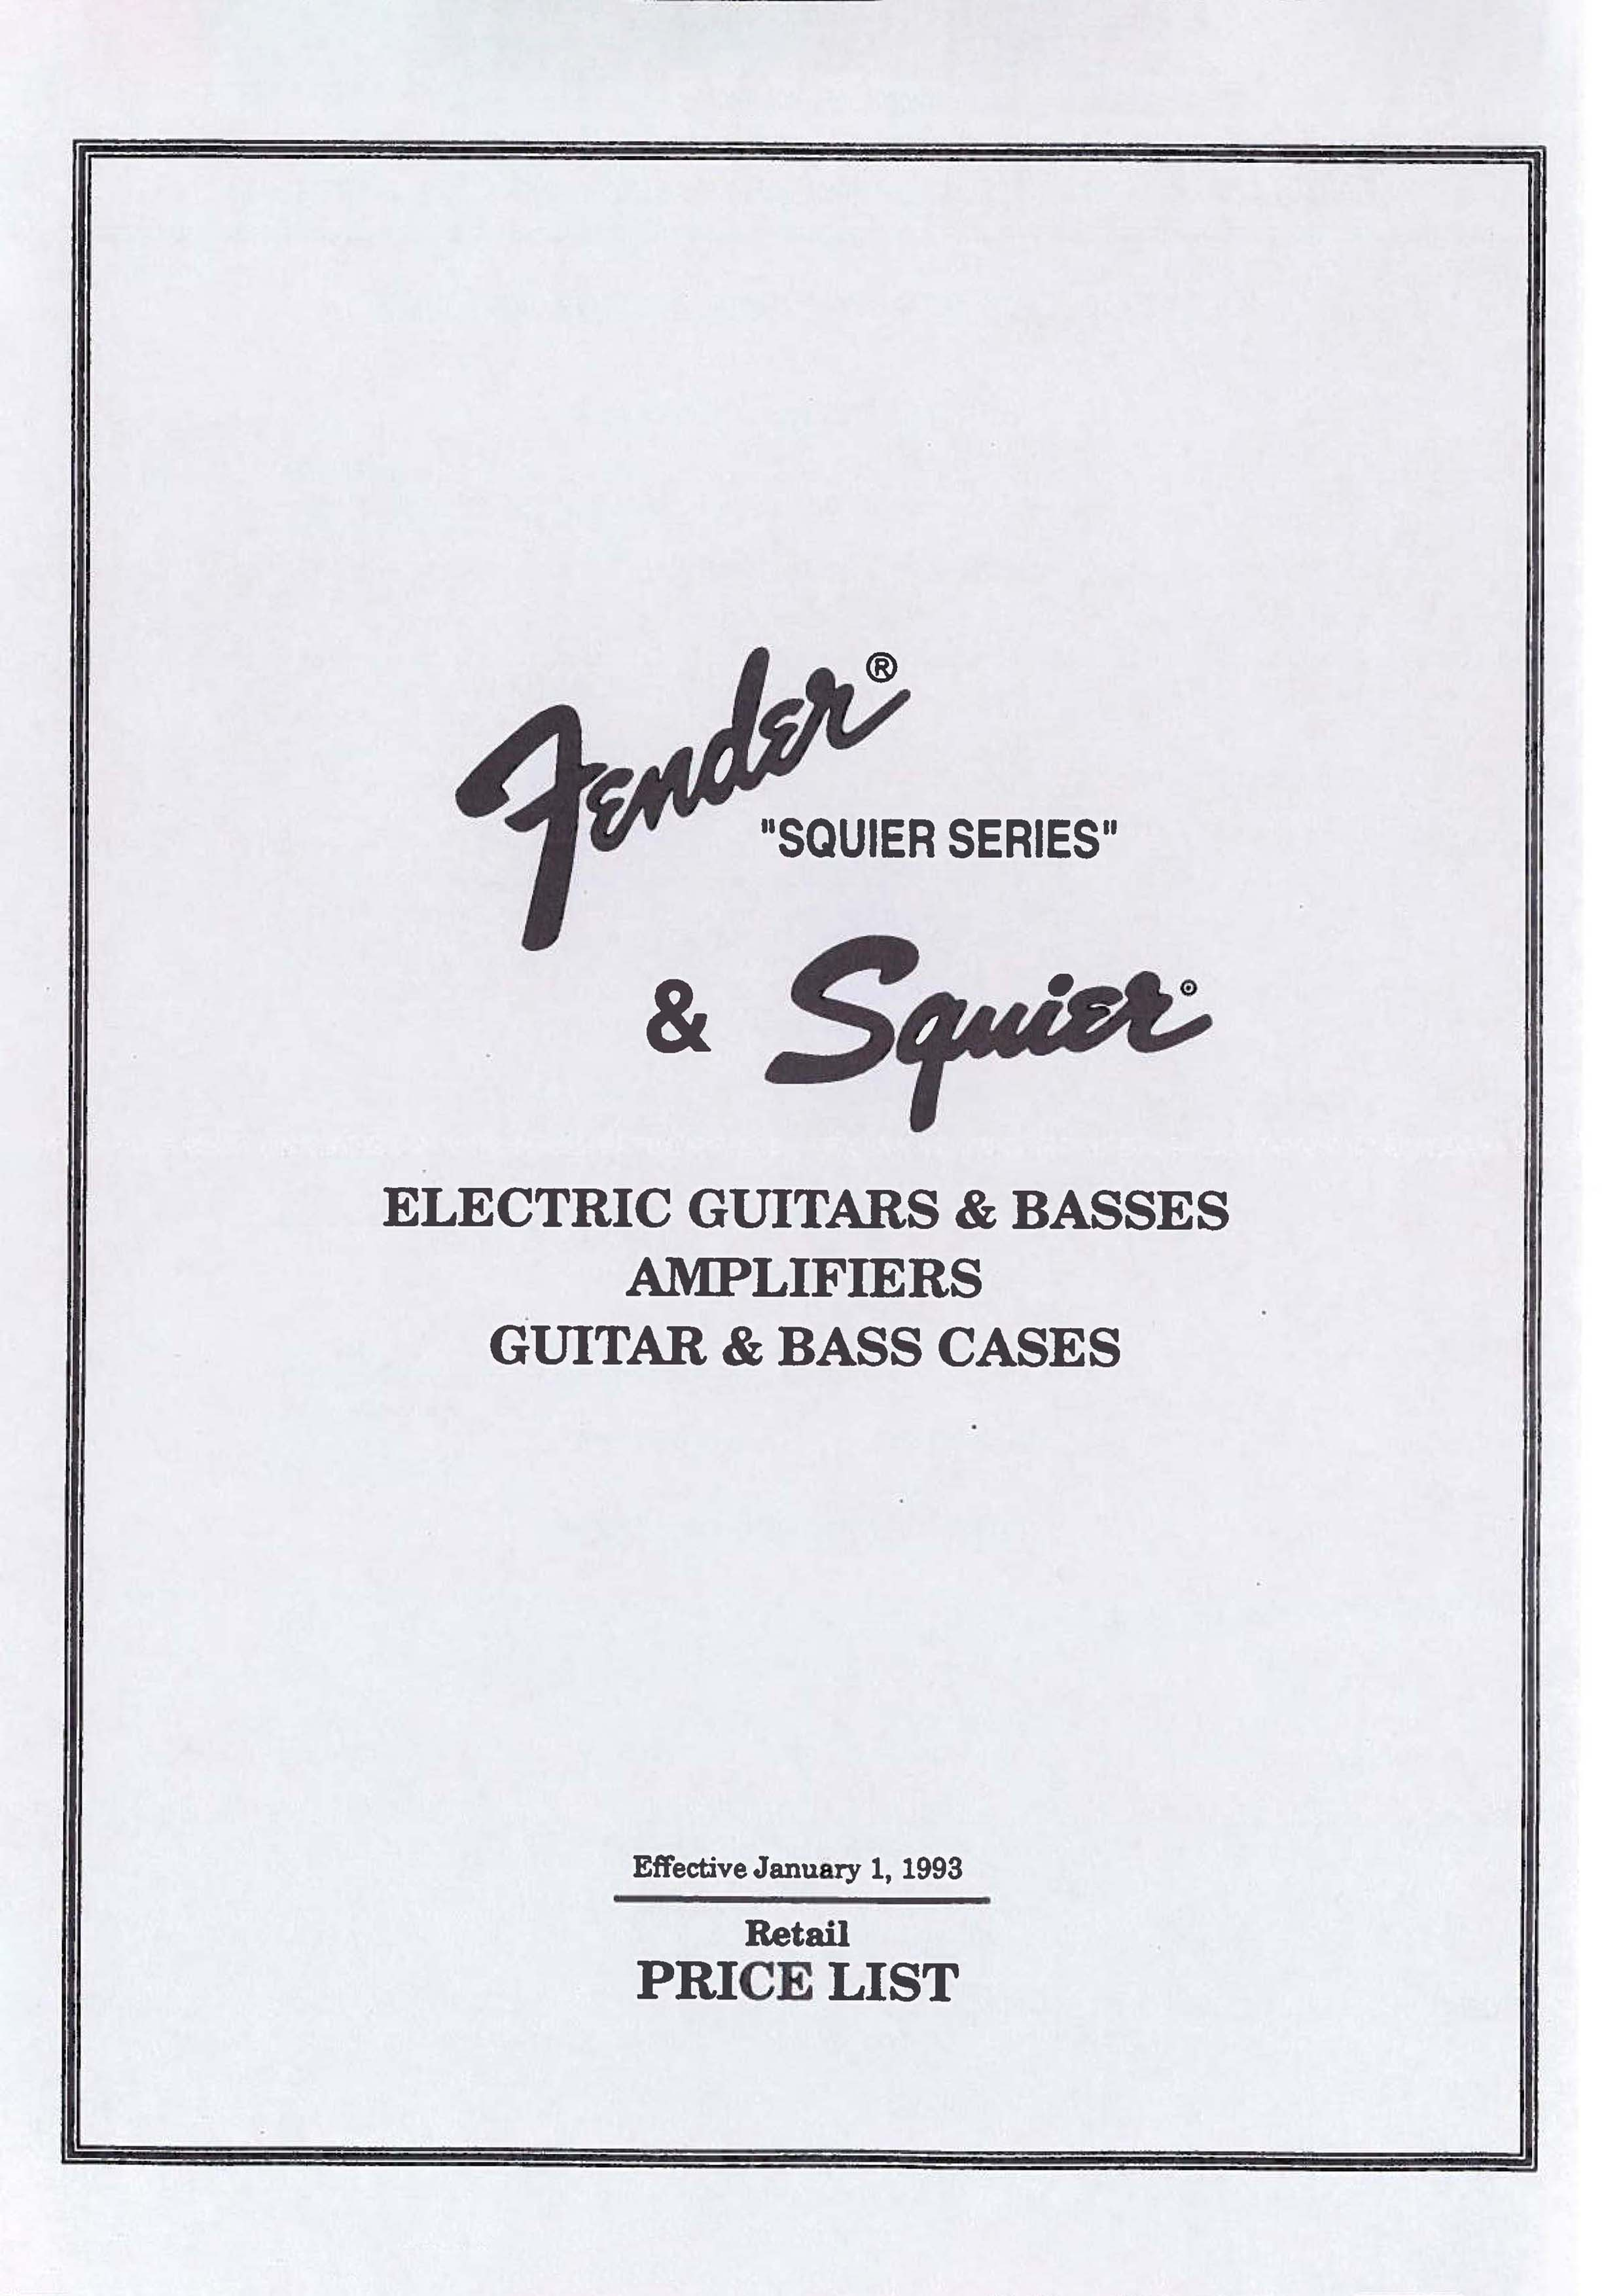 Fender Price list 1993